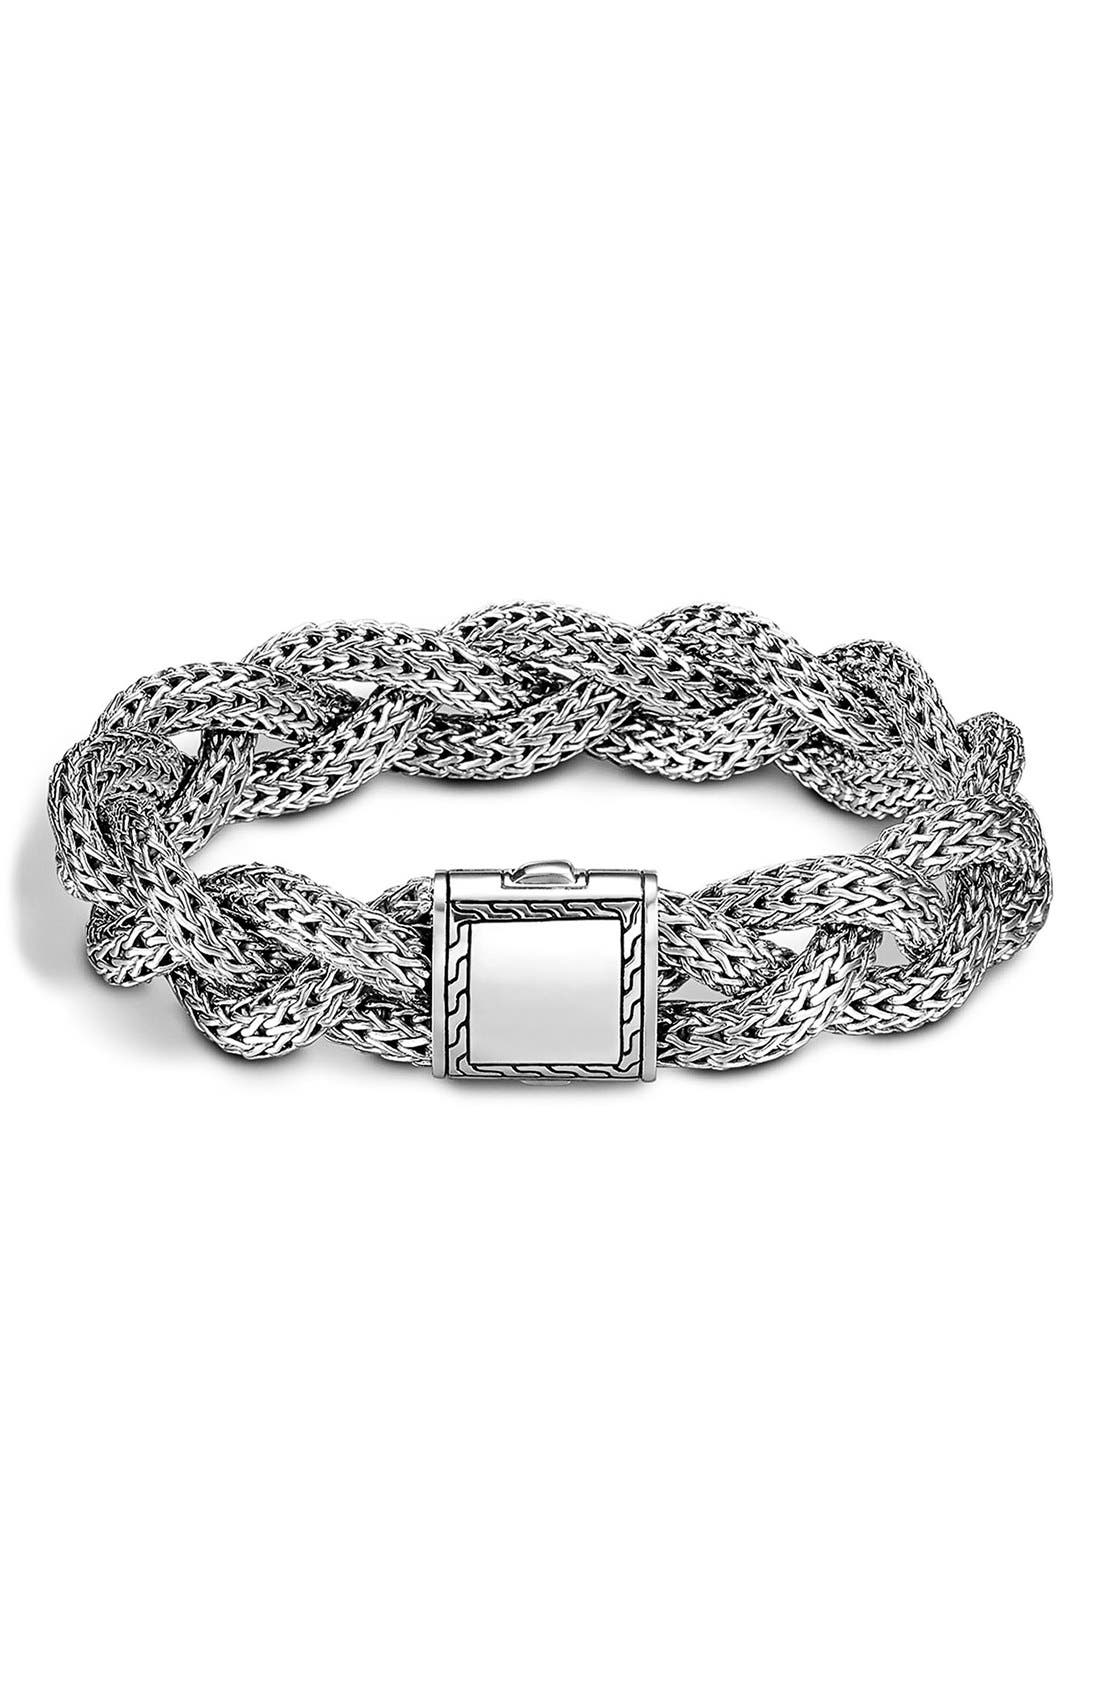 Alternate Image 1 Selected - John Hardy 'Classic Chain' Medium Braided Bracelet